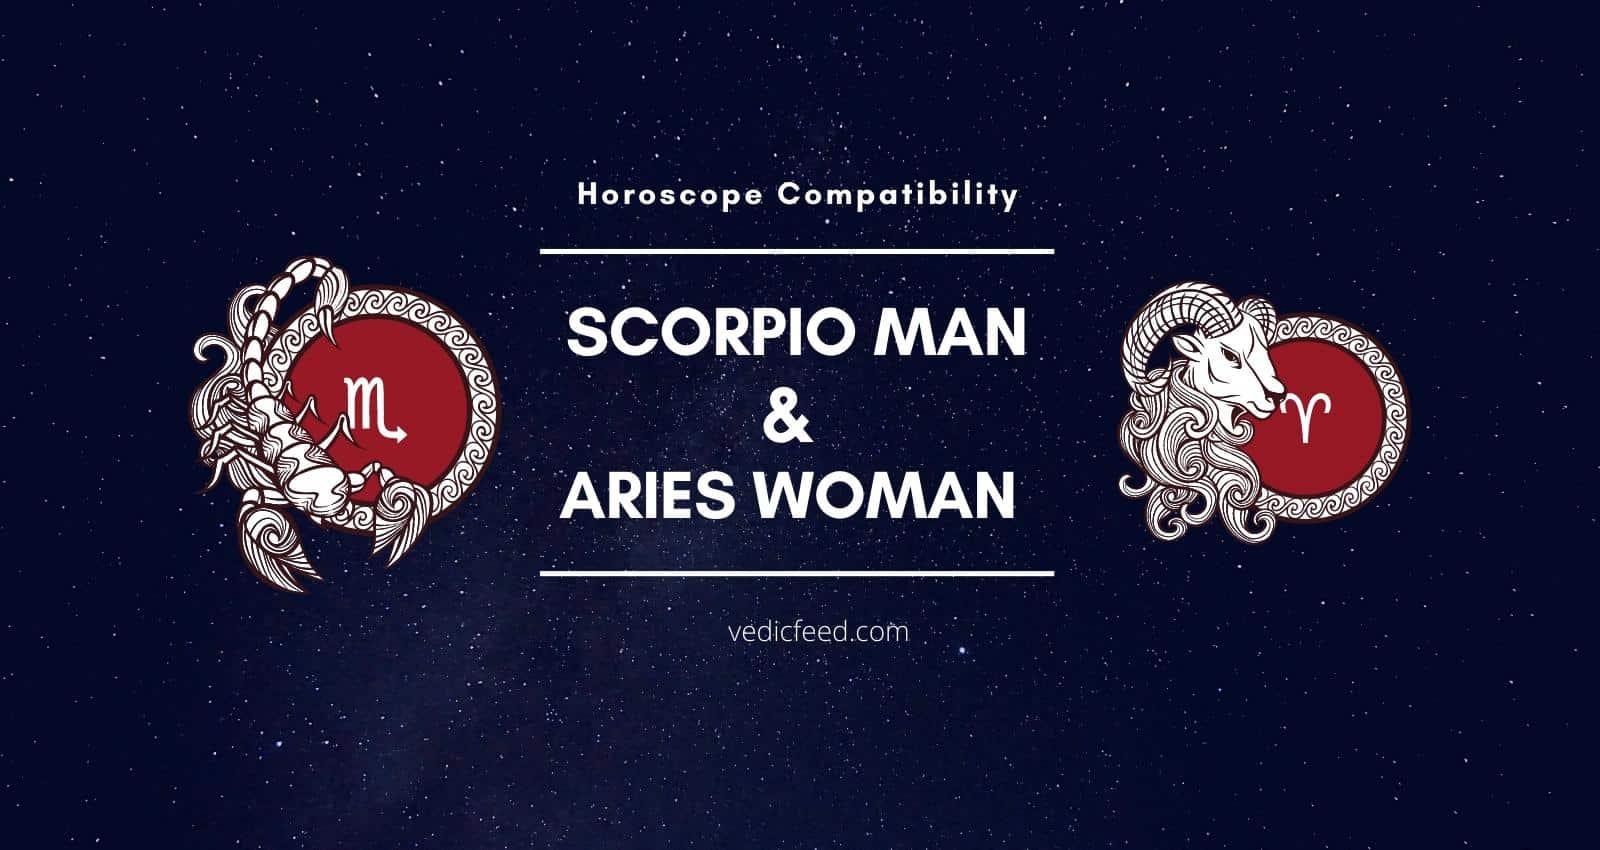 Scorpio Man and Aries Woman